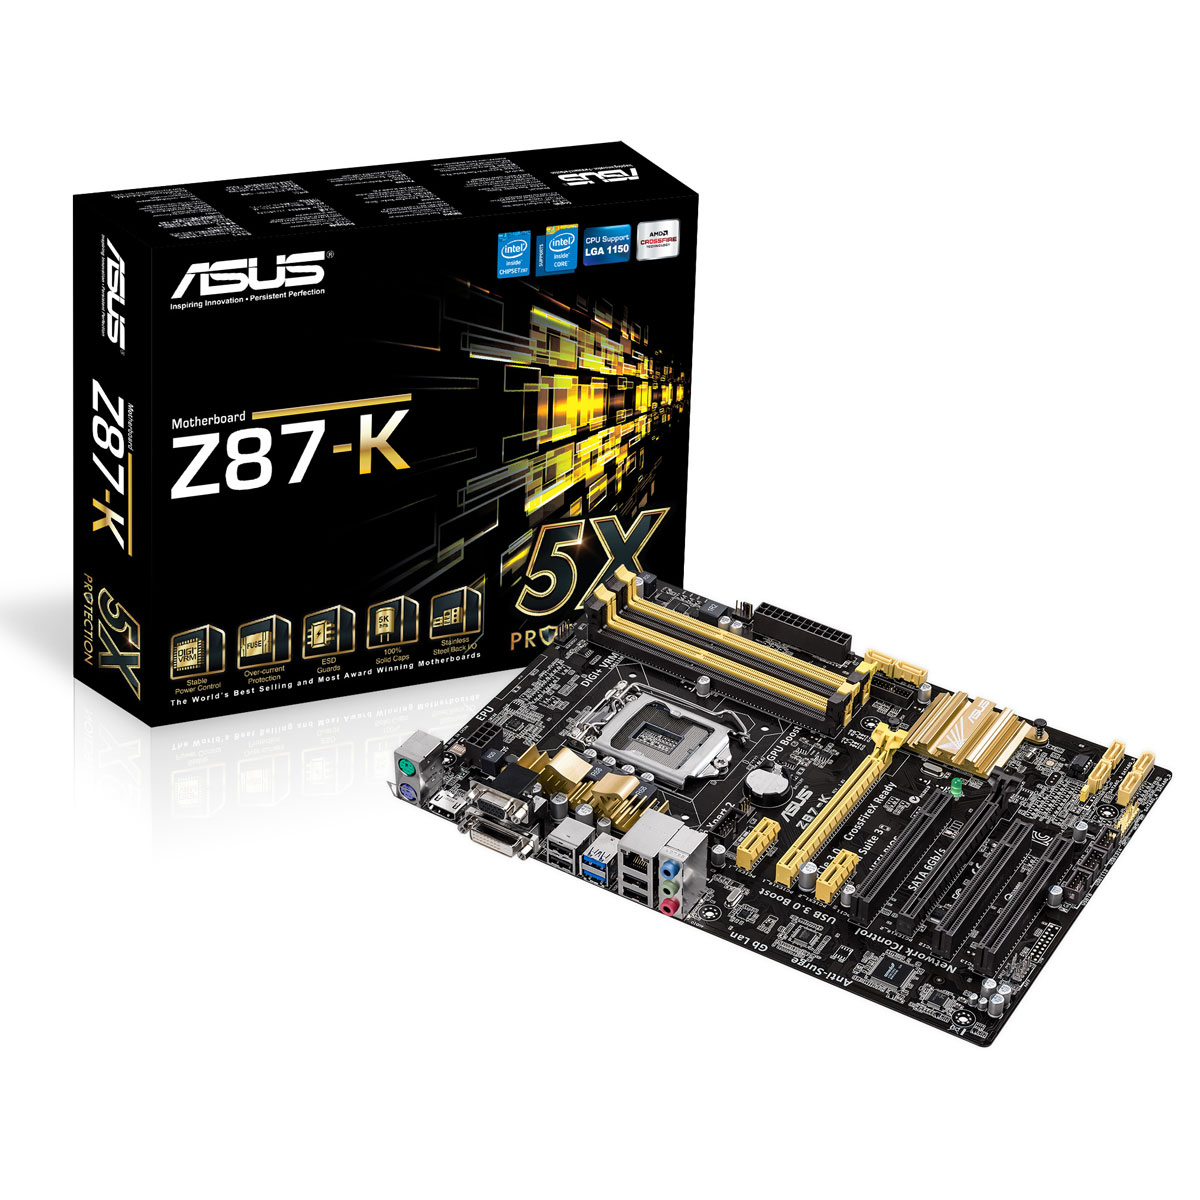 Carte mère ASUS Z87-K C2 Carte mère ATX Socket 1150 Intel Z87 Express - SATA 6Gb/s - USB 3.0 - 1x PCI-Express 3.0 16x + 1x PCI-Express 2.0 16x